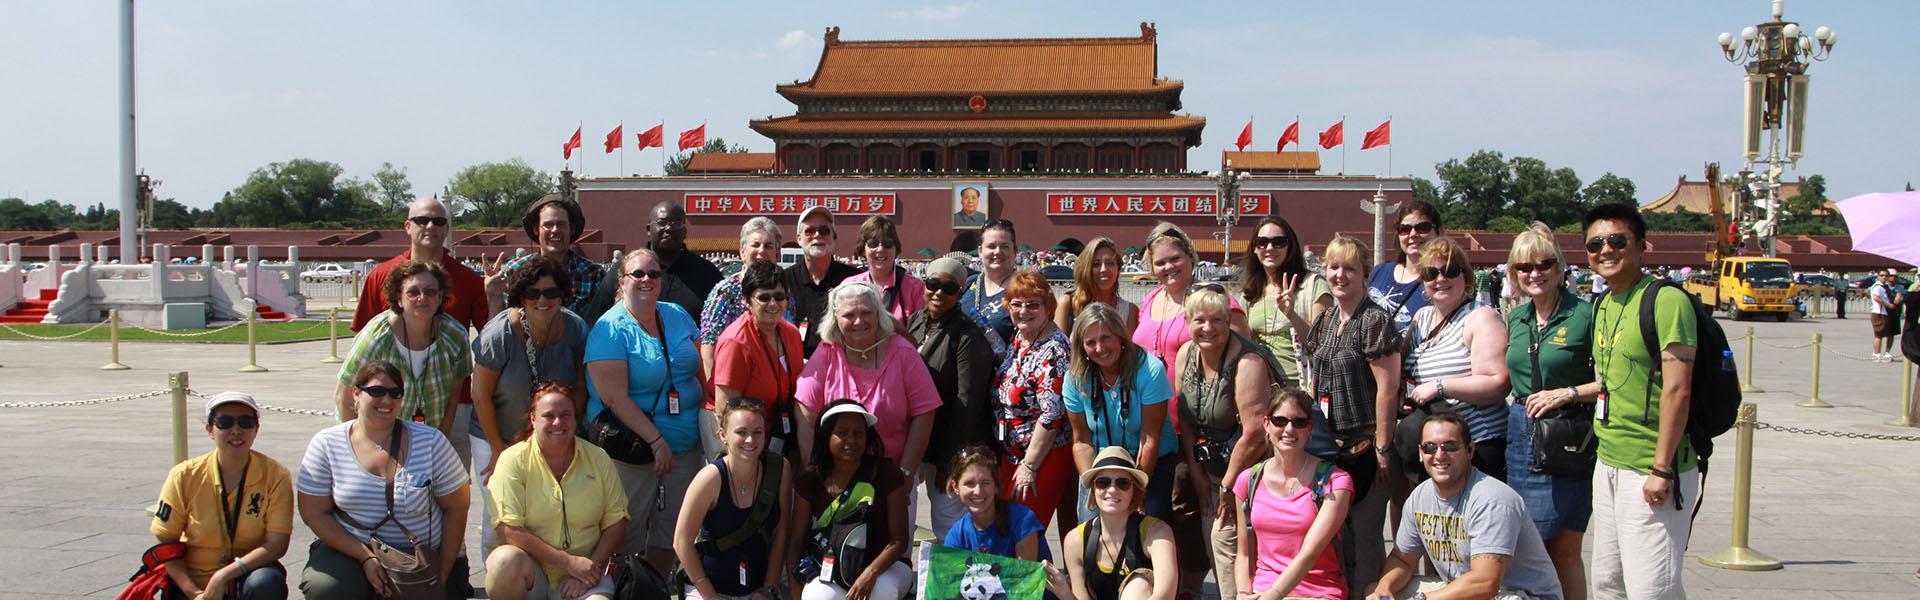 Classic China Tours